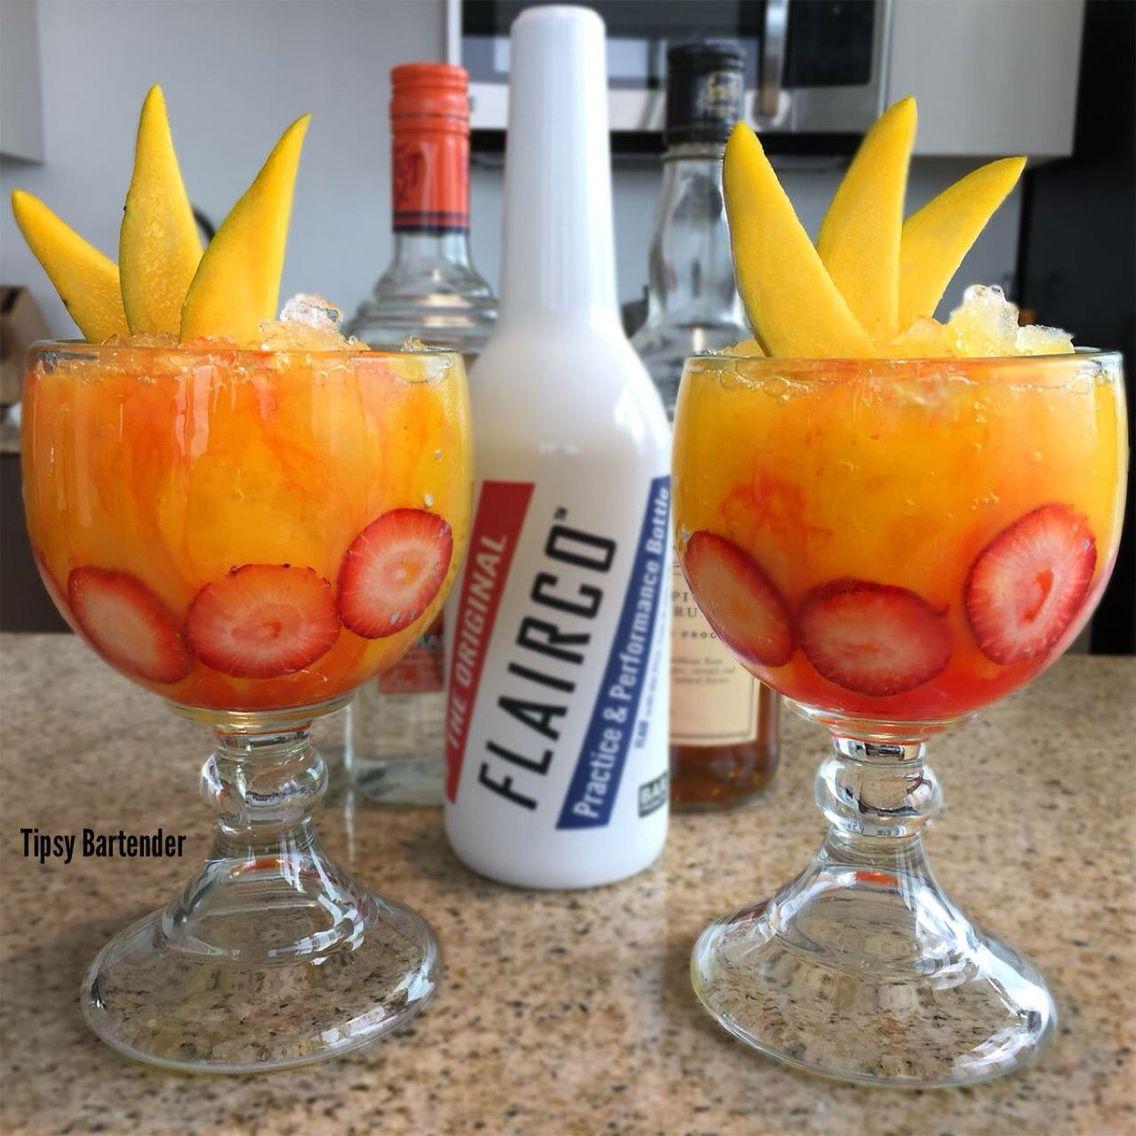 Mango Mai Tai 1oz Spiced Rum, 1oz Mango Rum, 3oz Mango